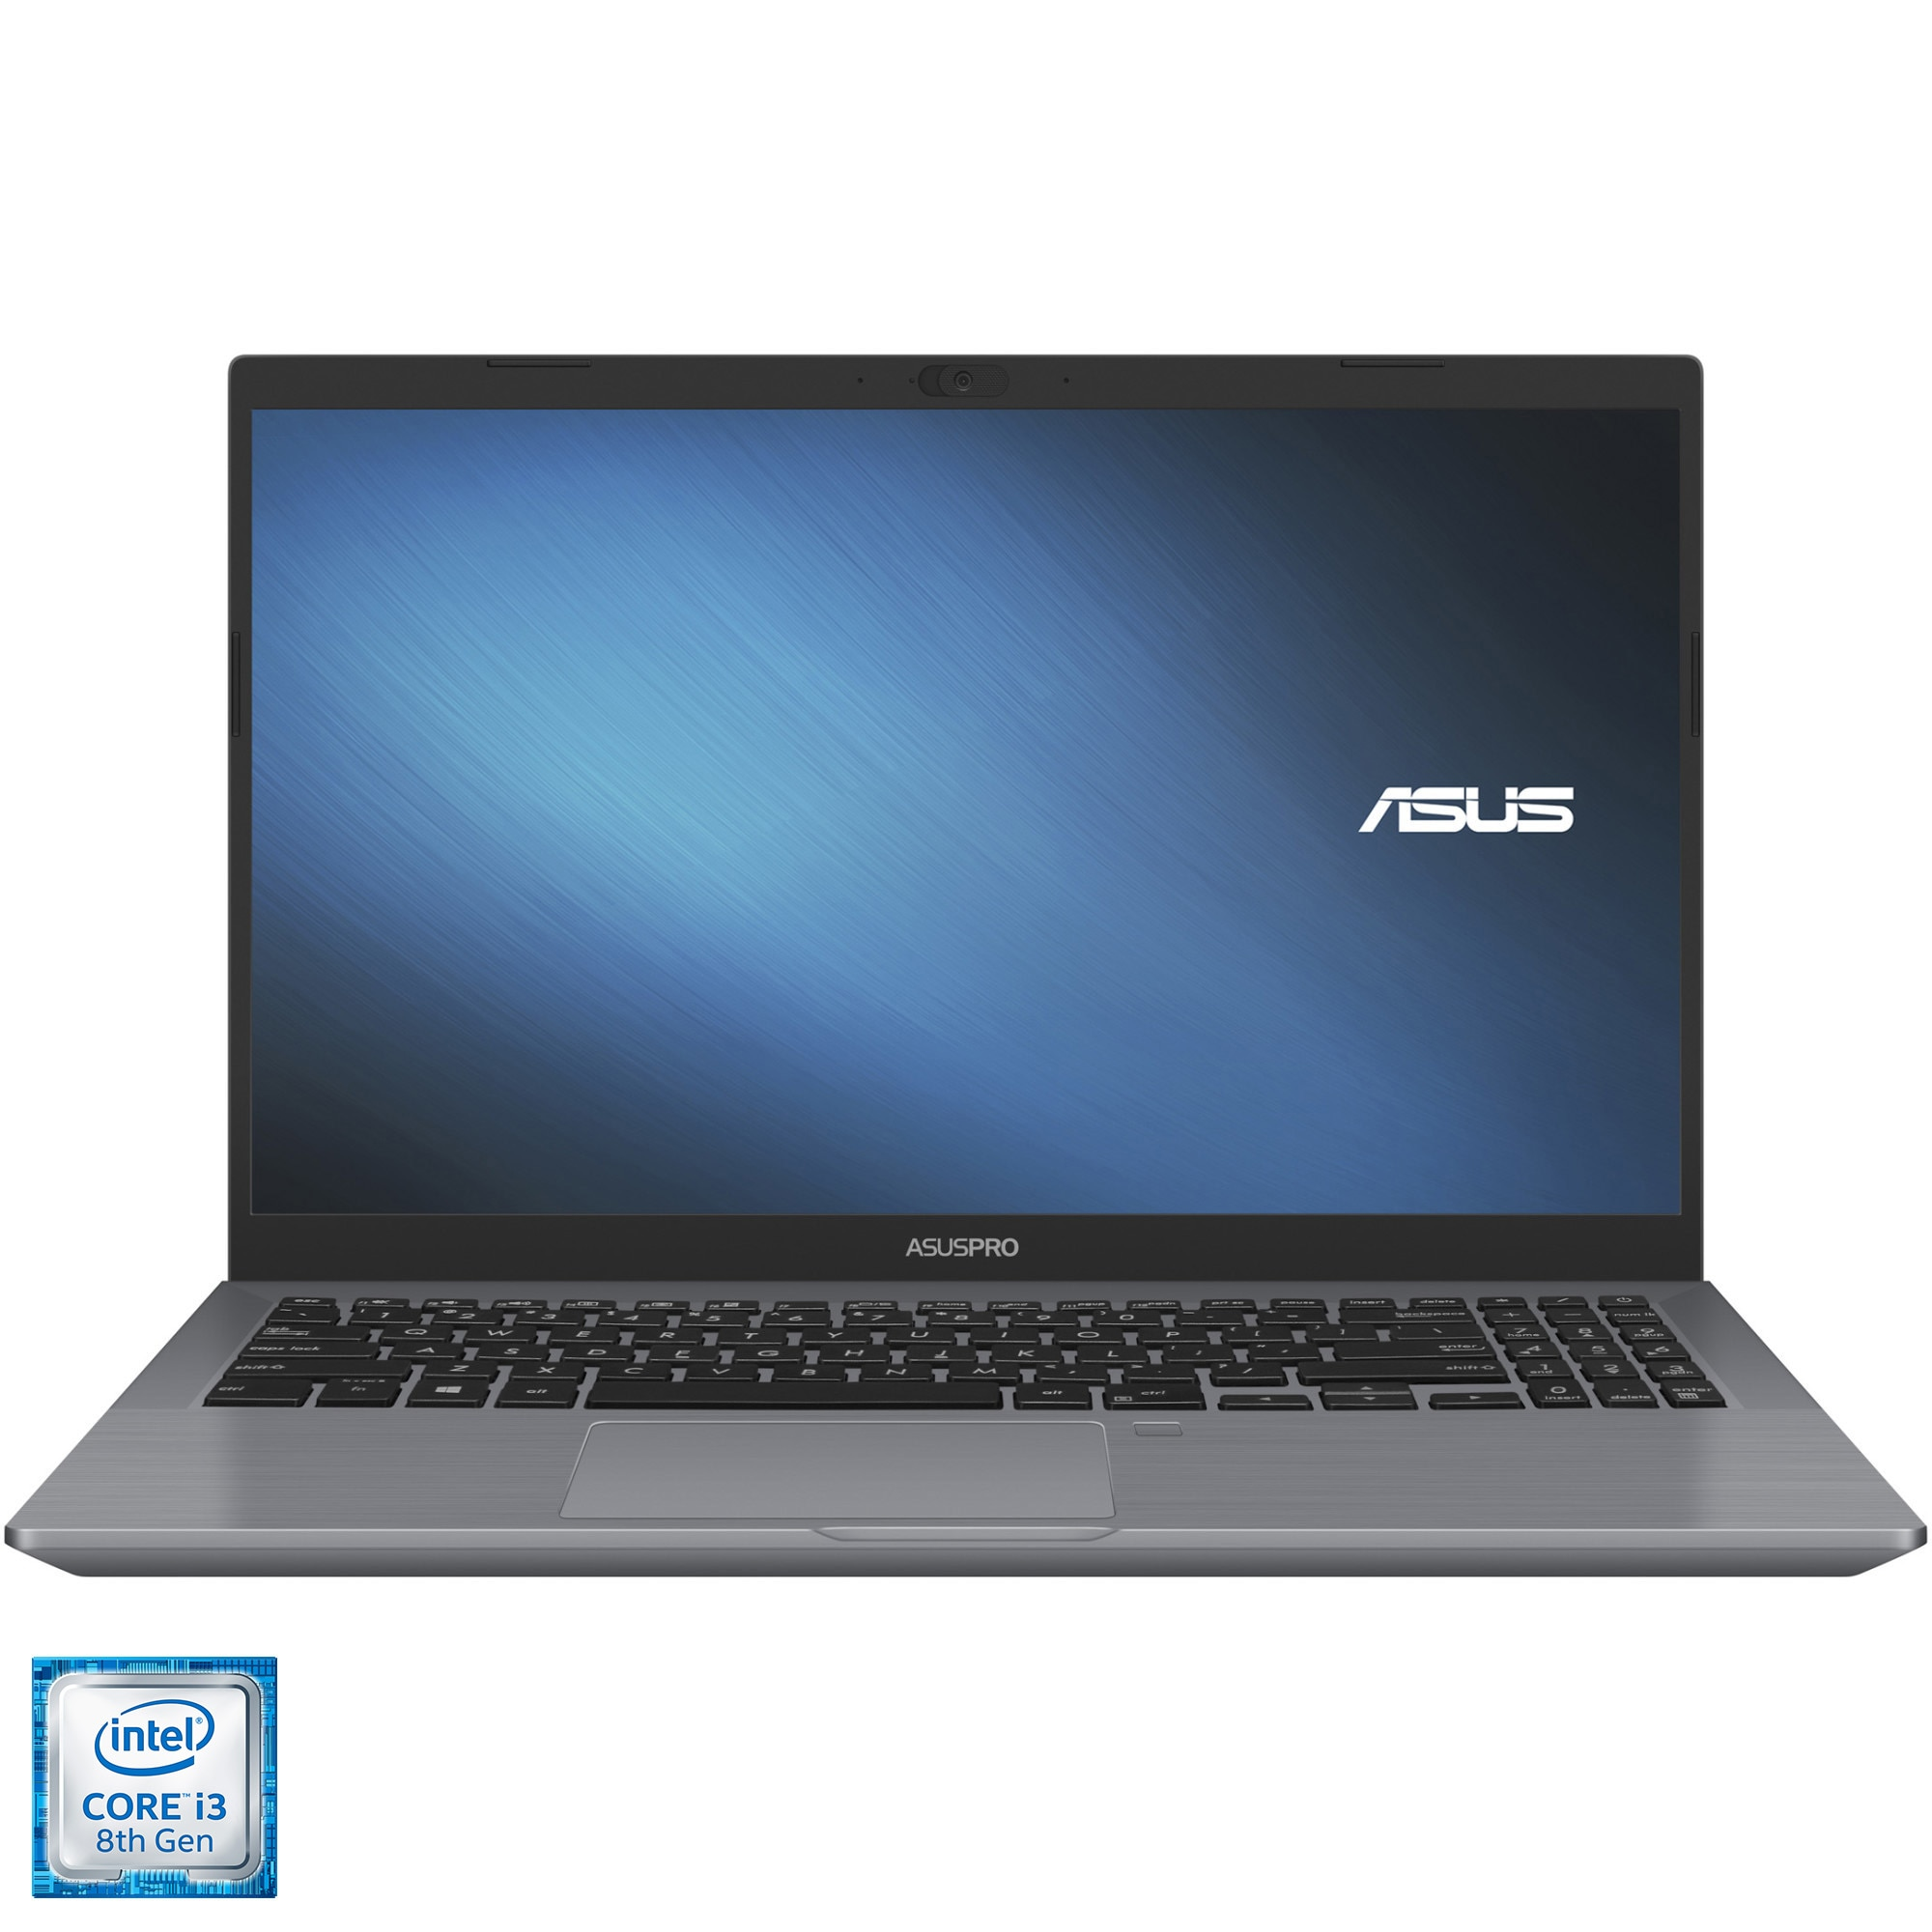 "Fotografie Laptop ASUS ExpertBook P3540FA cu procesor Intel Core i3-8145U, 15.6"", HD, 4GB, 1TB HDD, Intel® UHD Graphics, Endless OS, Grey"